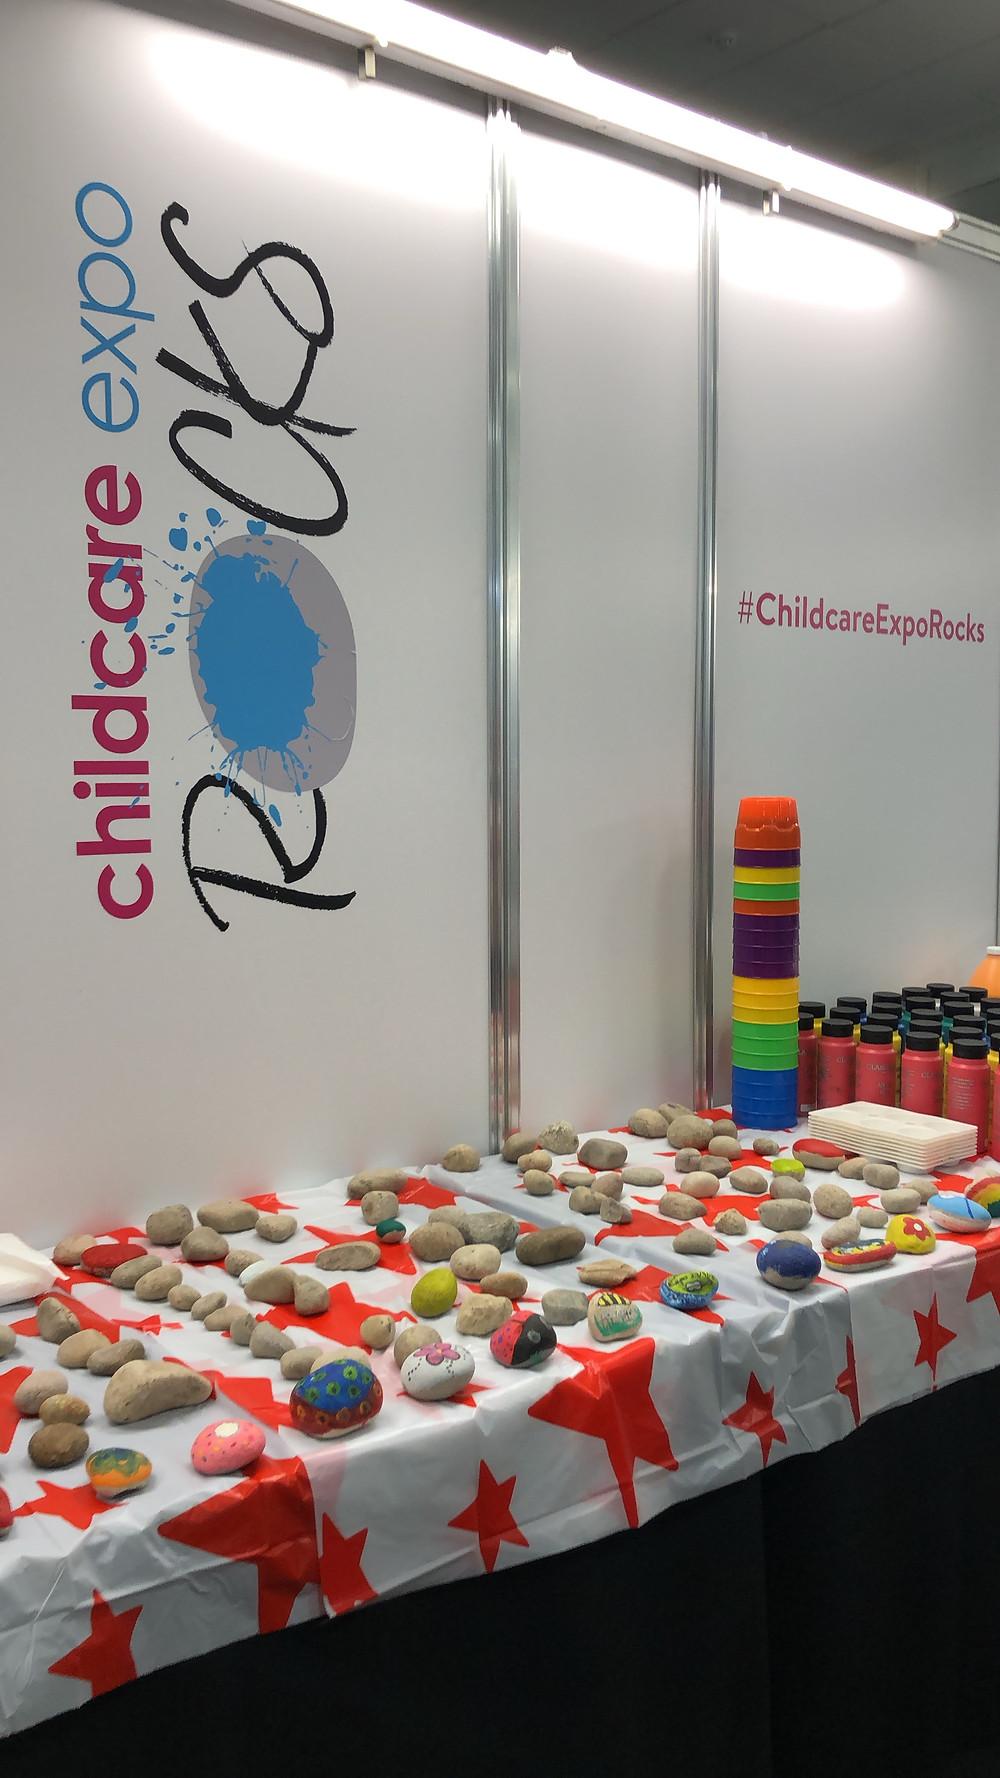 childcare expo rocks